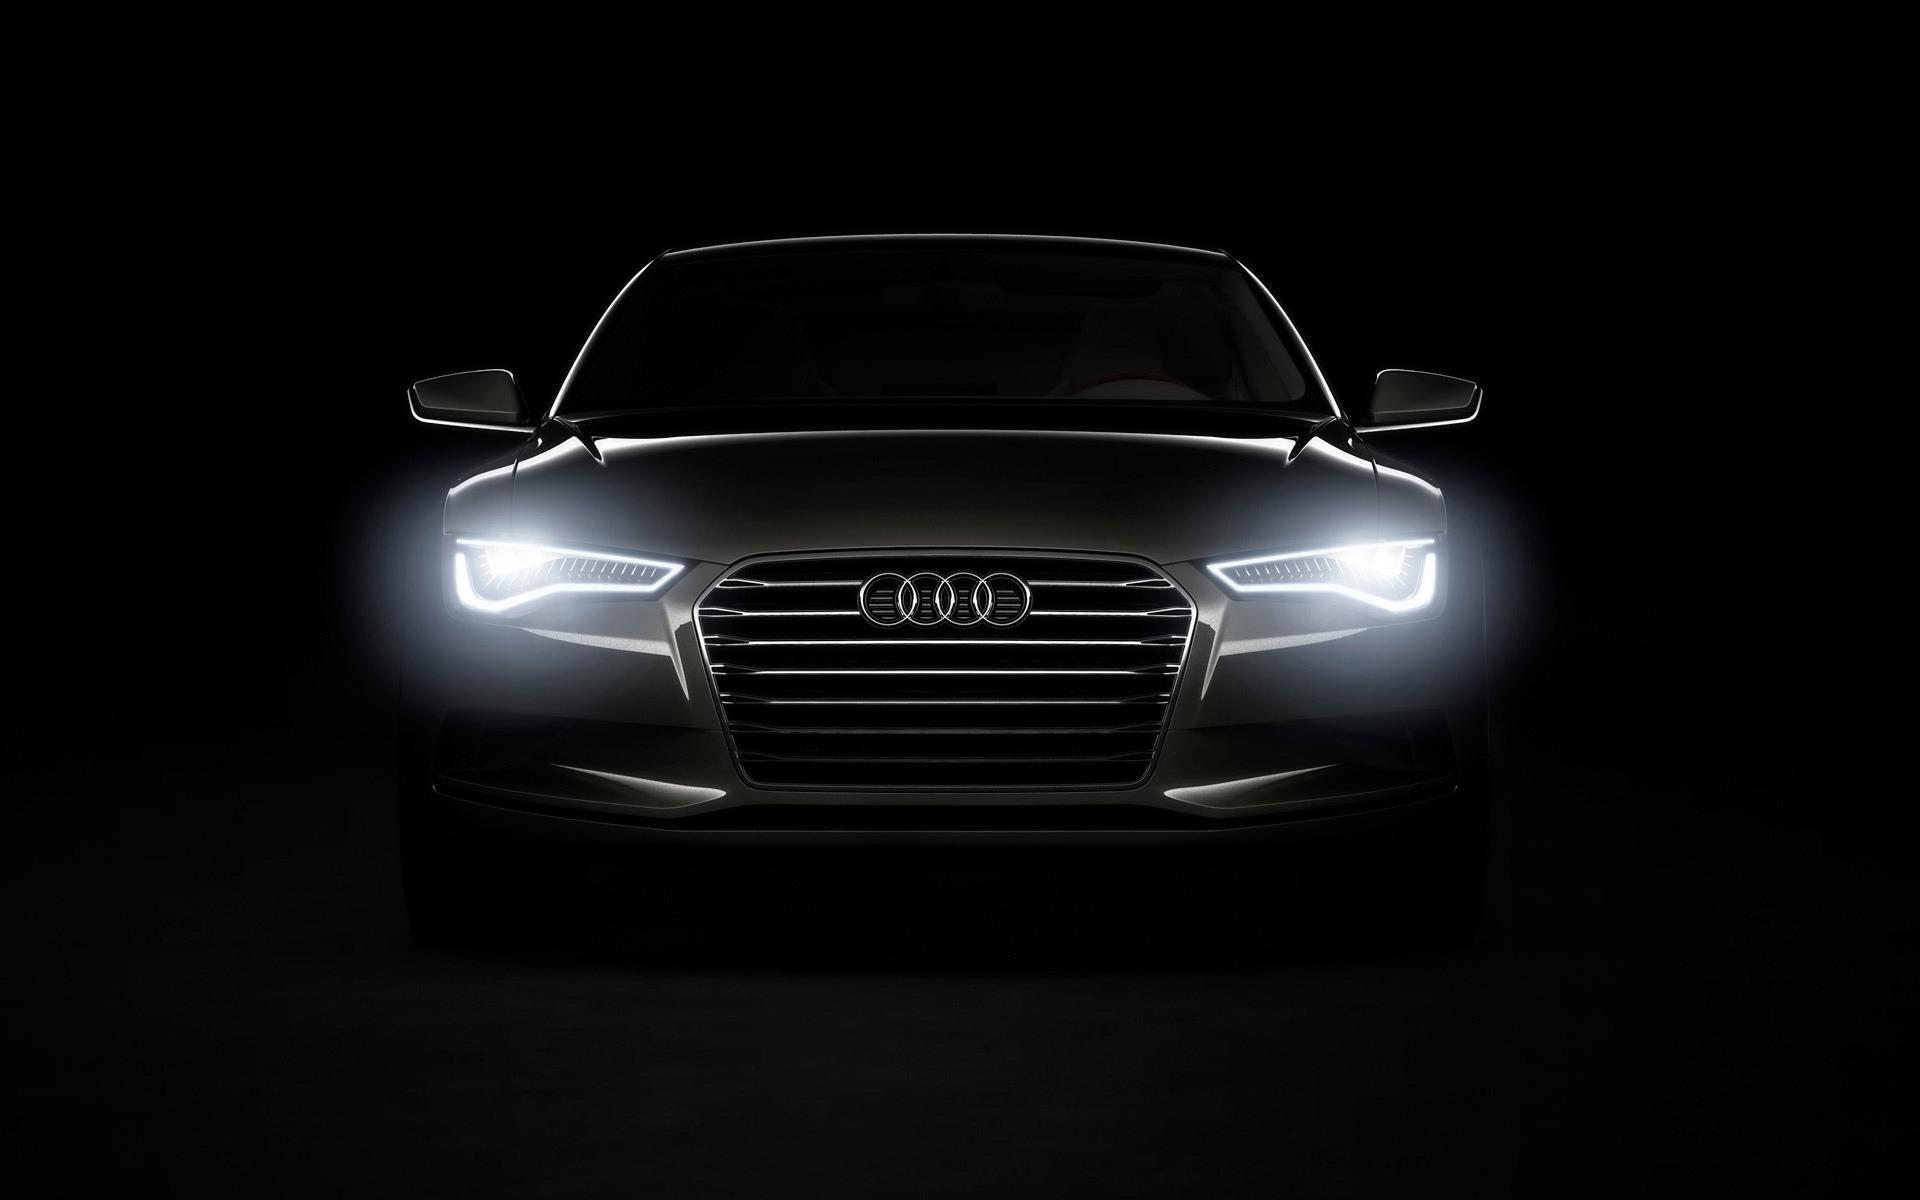 Audi A7 Concept Wallpaper Cars Wallpapers